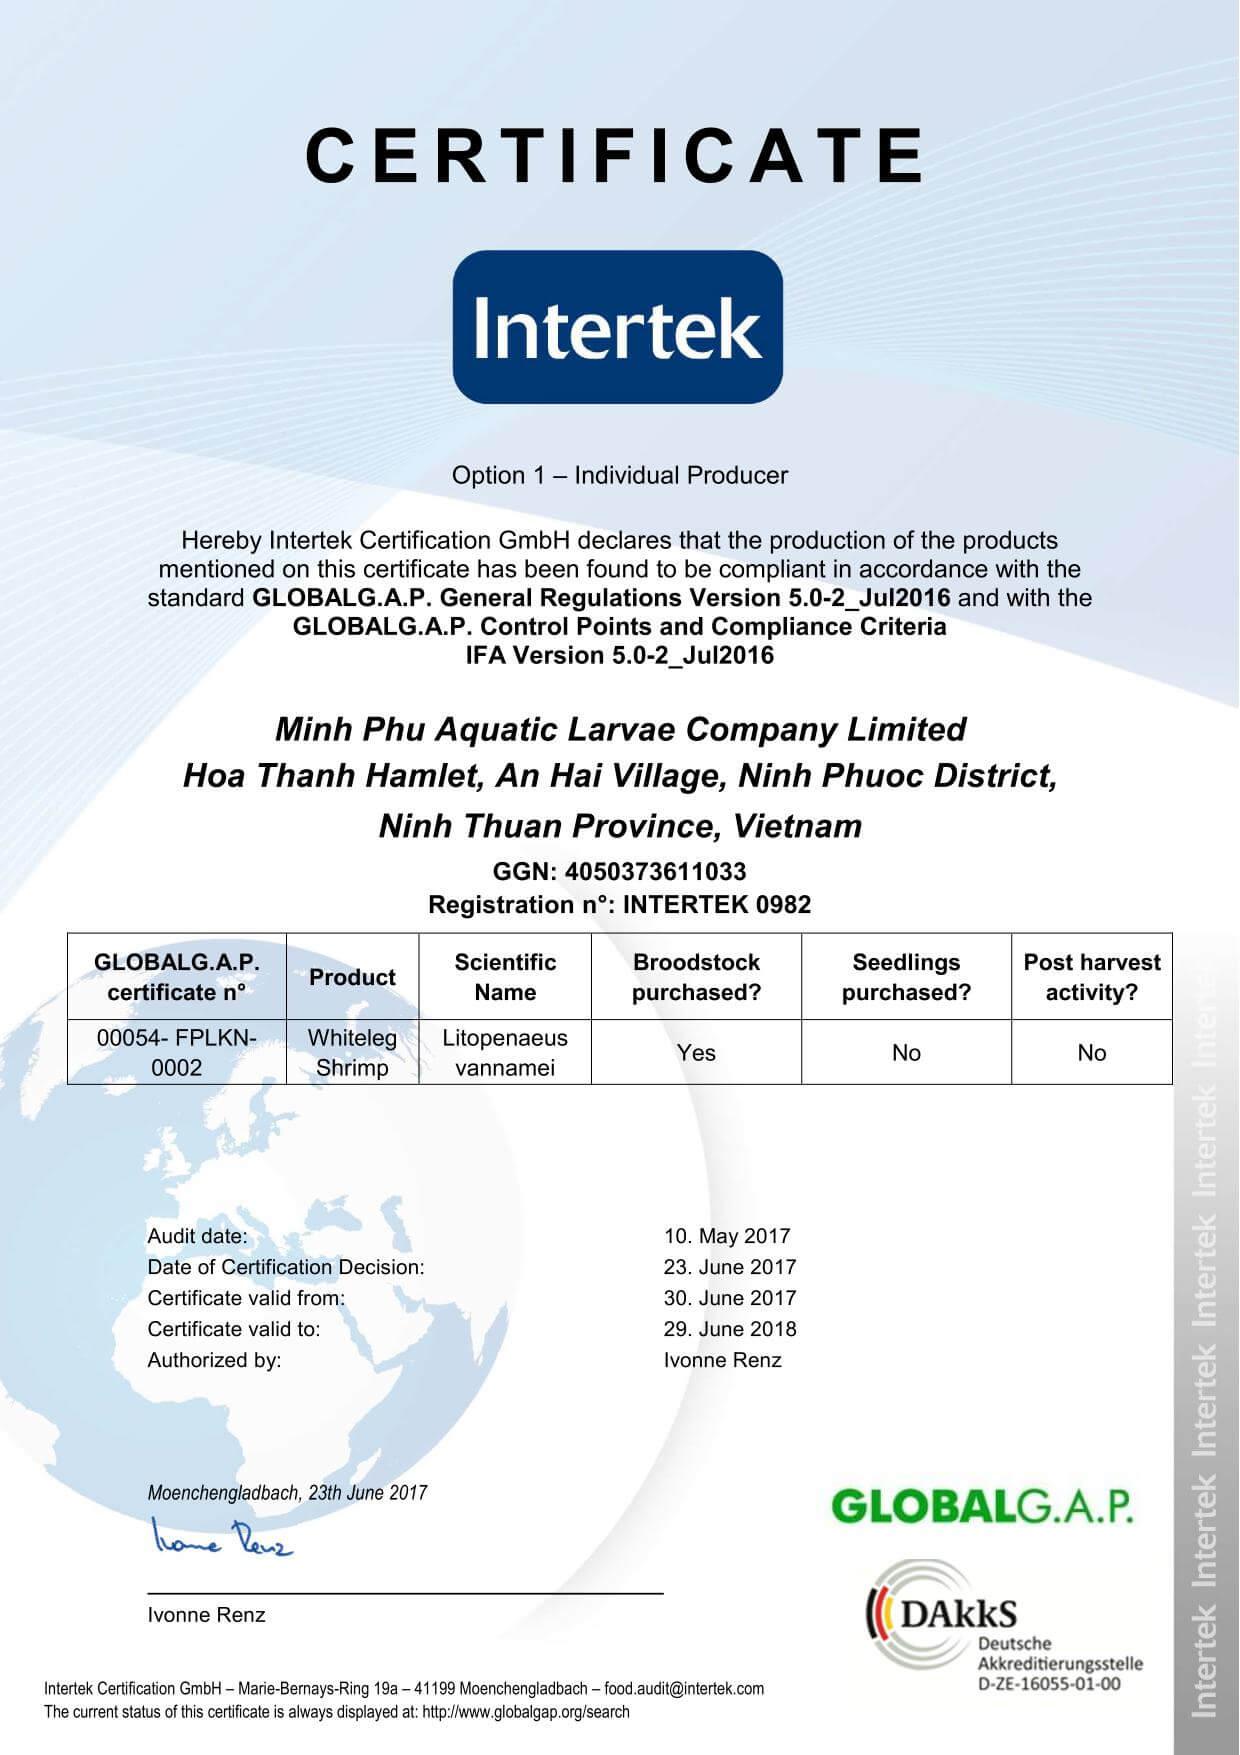 FINAL-GGAP Aqua Certificate_Minh Phu Aquatic Larvae Company Limited